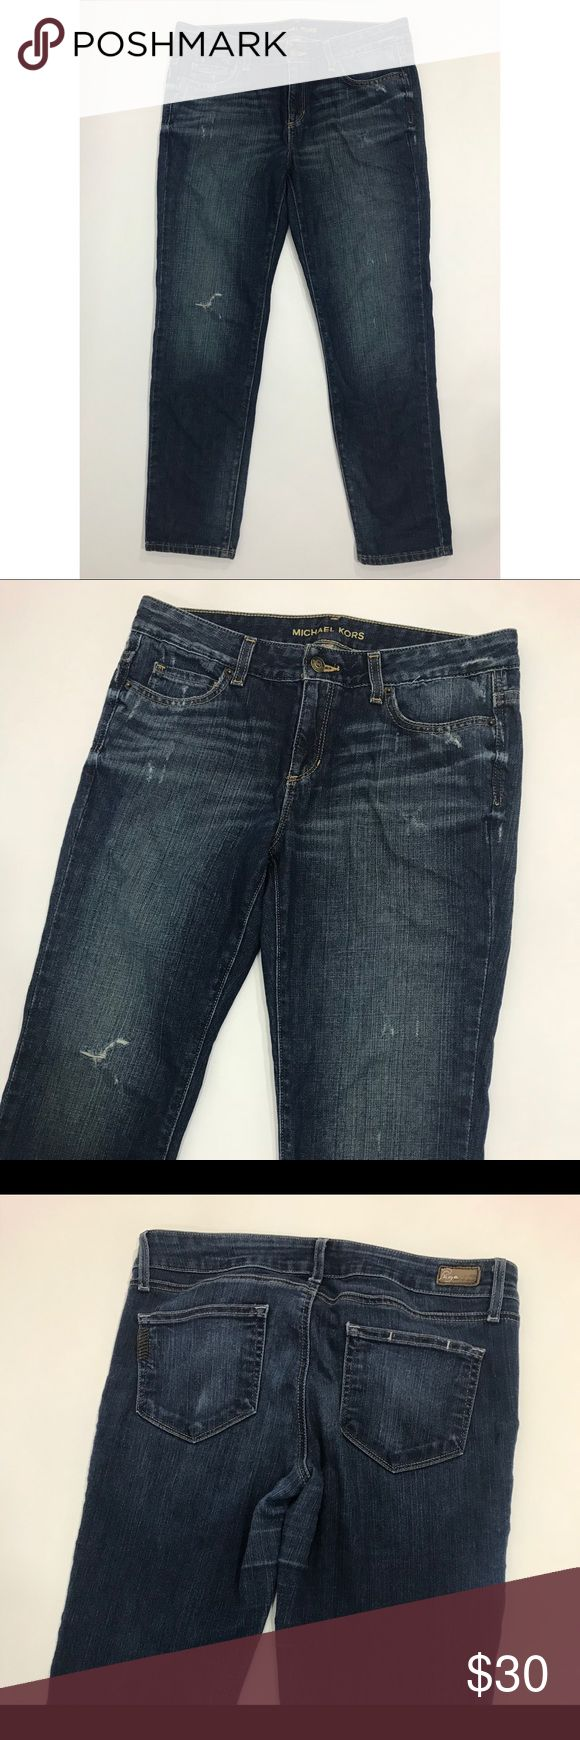 Michael Kors Jeans 4 Blue Distressed Boyfriend Fit Michael Kors Womens Jeans Size 4 Dark Blue Denim Distressed Boyfriend Fit. Measurements: (in inches) - Waist: 32 - Length: 35 -Inseam: 26 Michael Kors Jeans Boyfriend